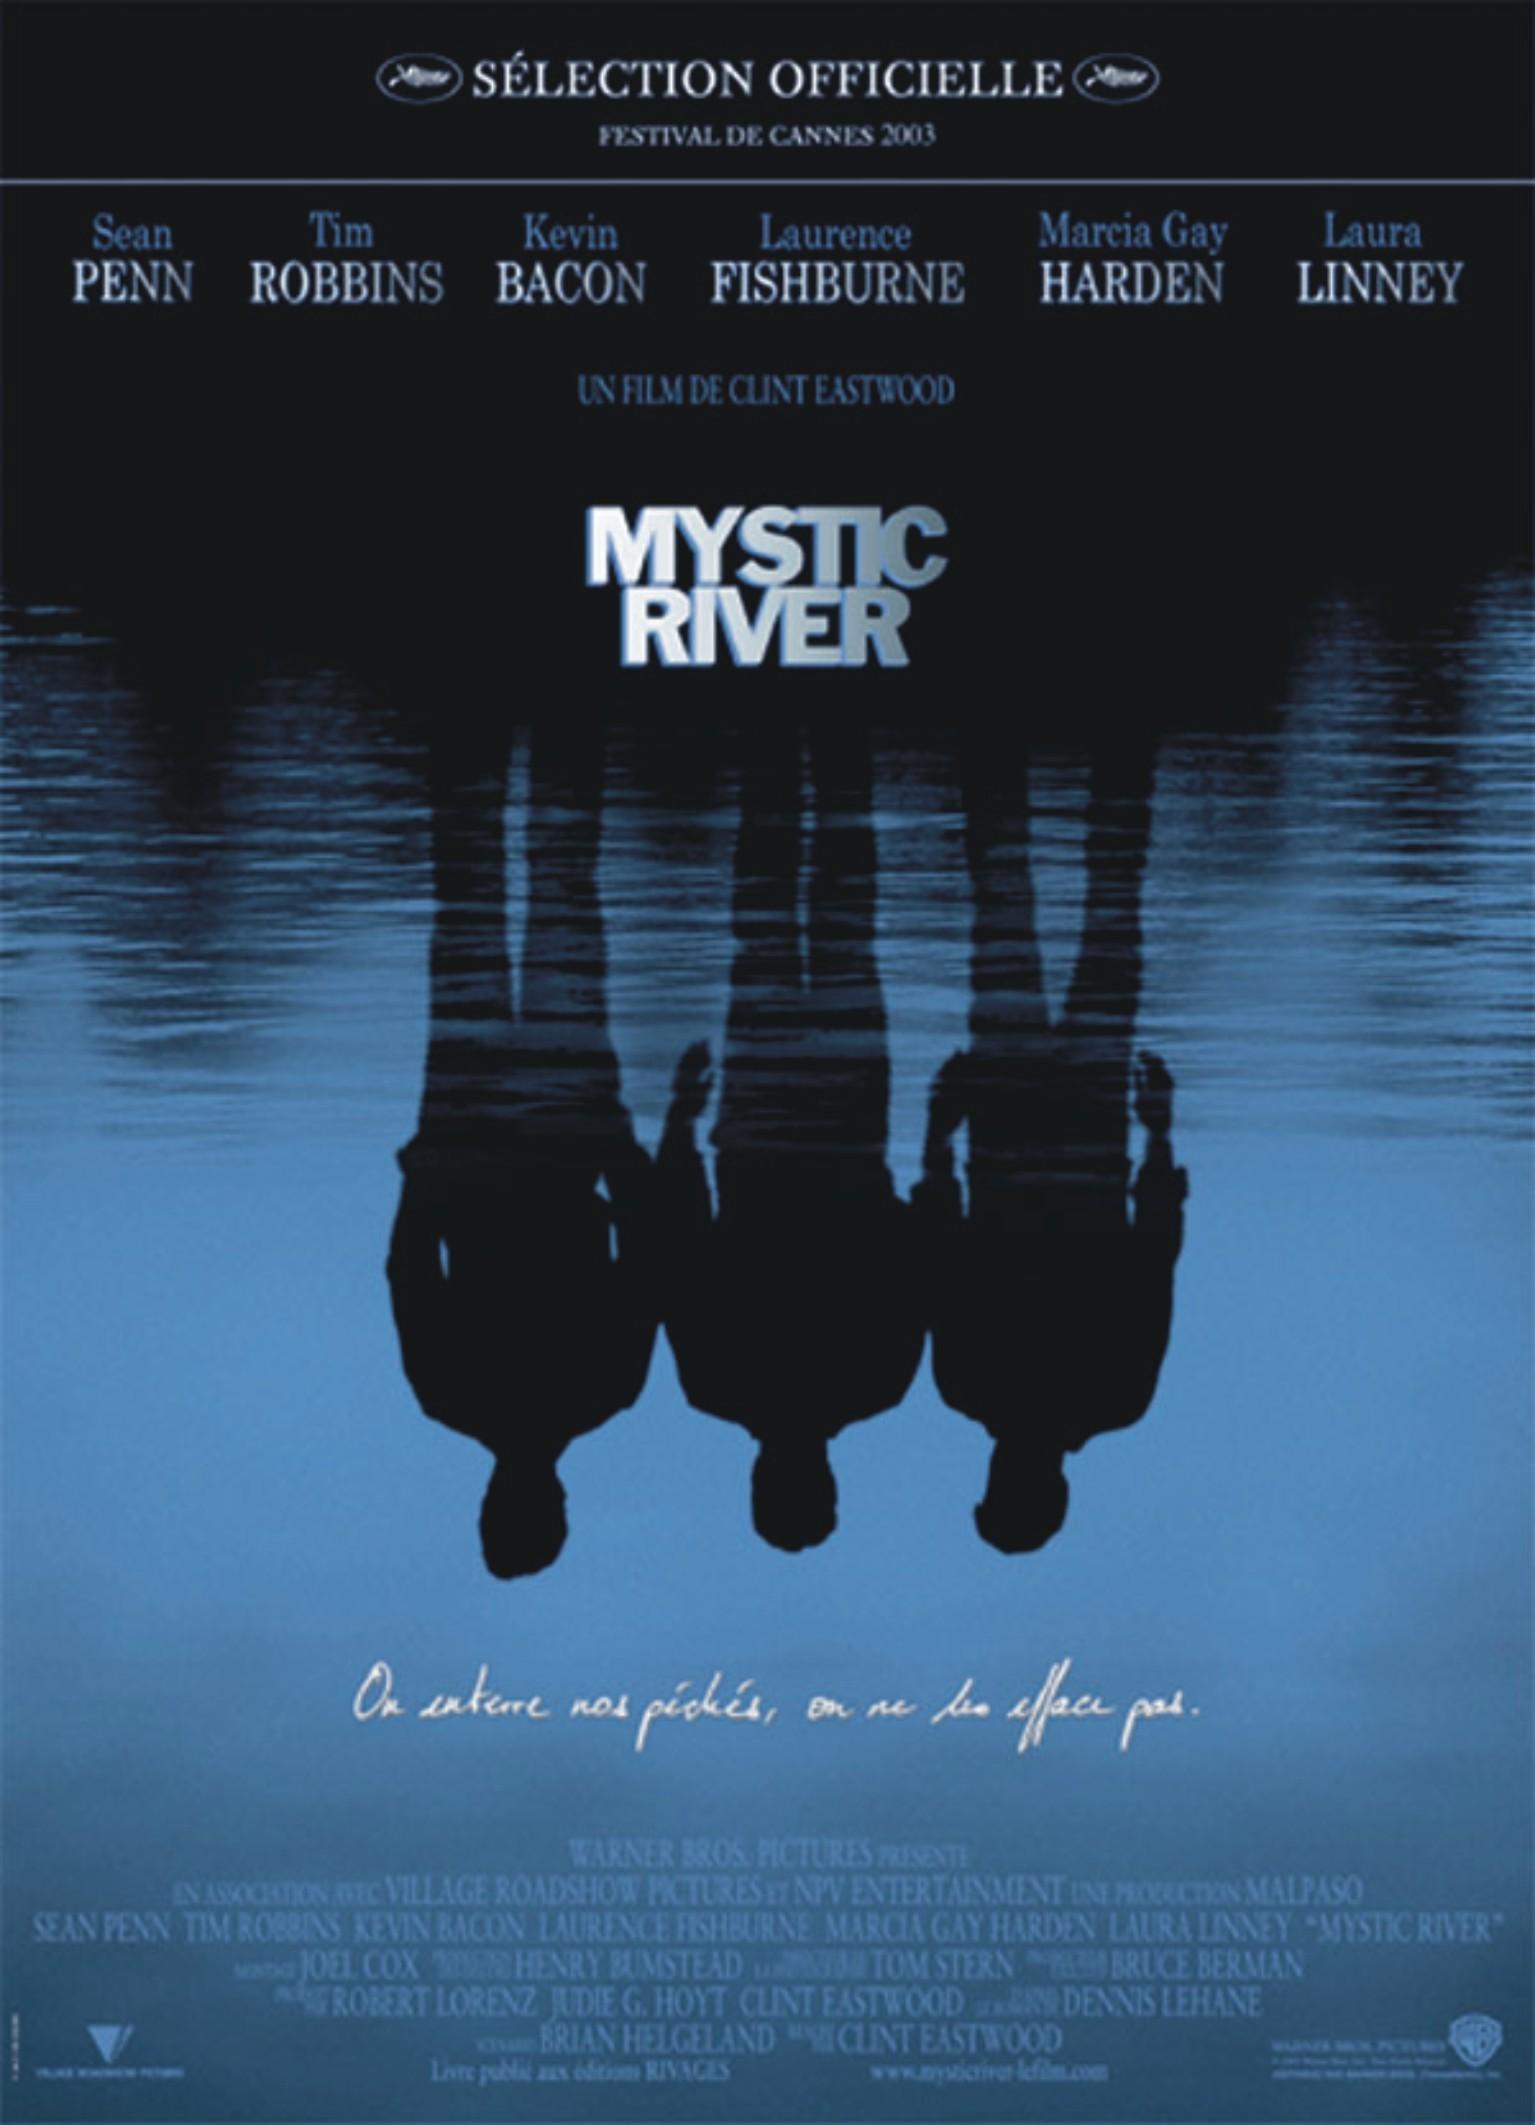 رودخانه مرموز (تیم رابینز و شون پن)